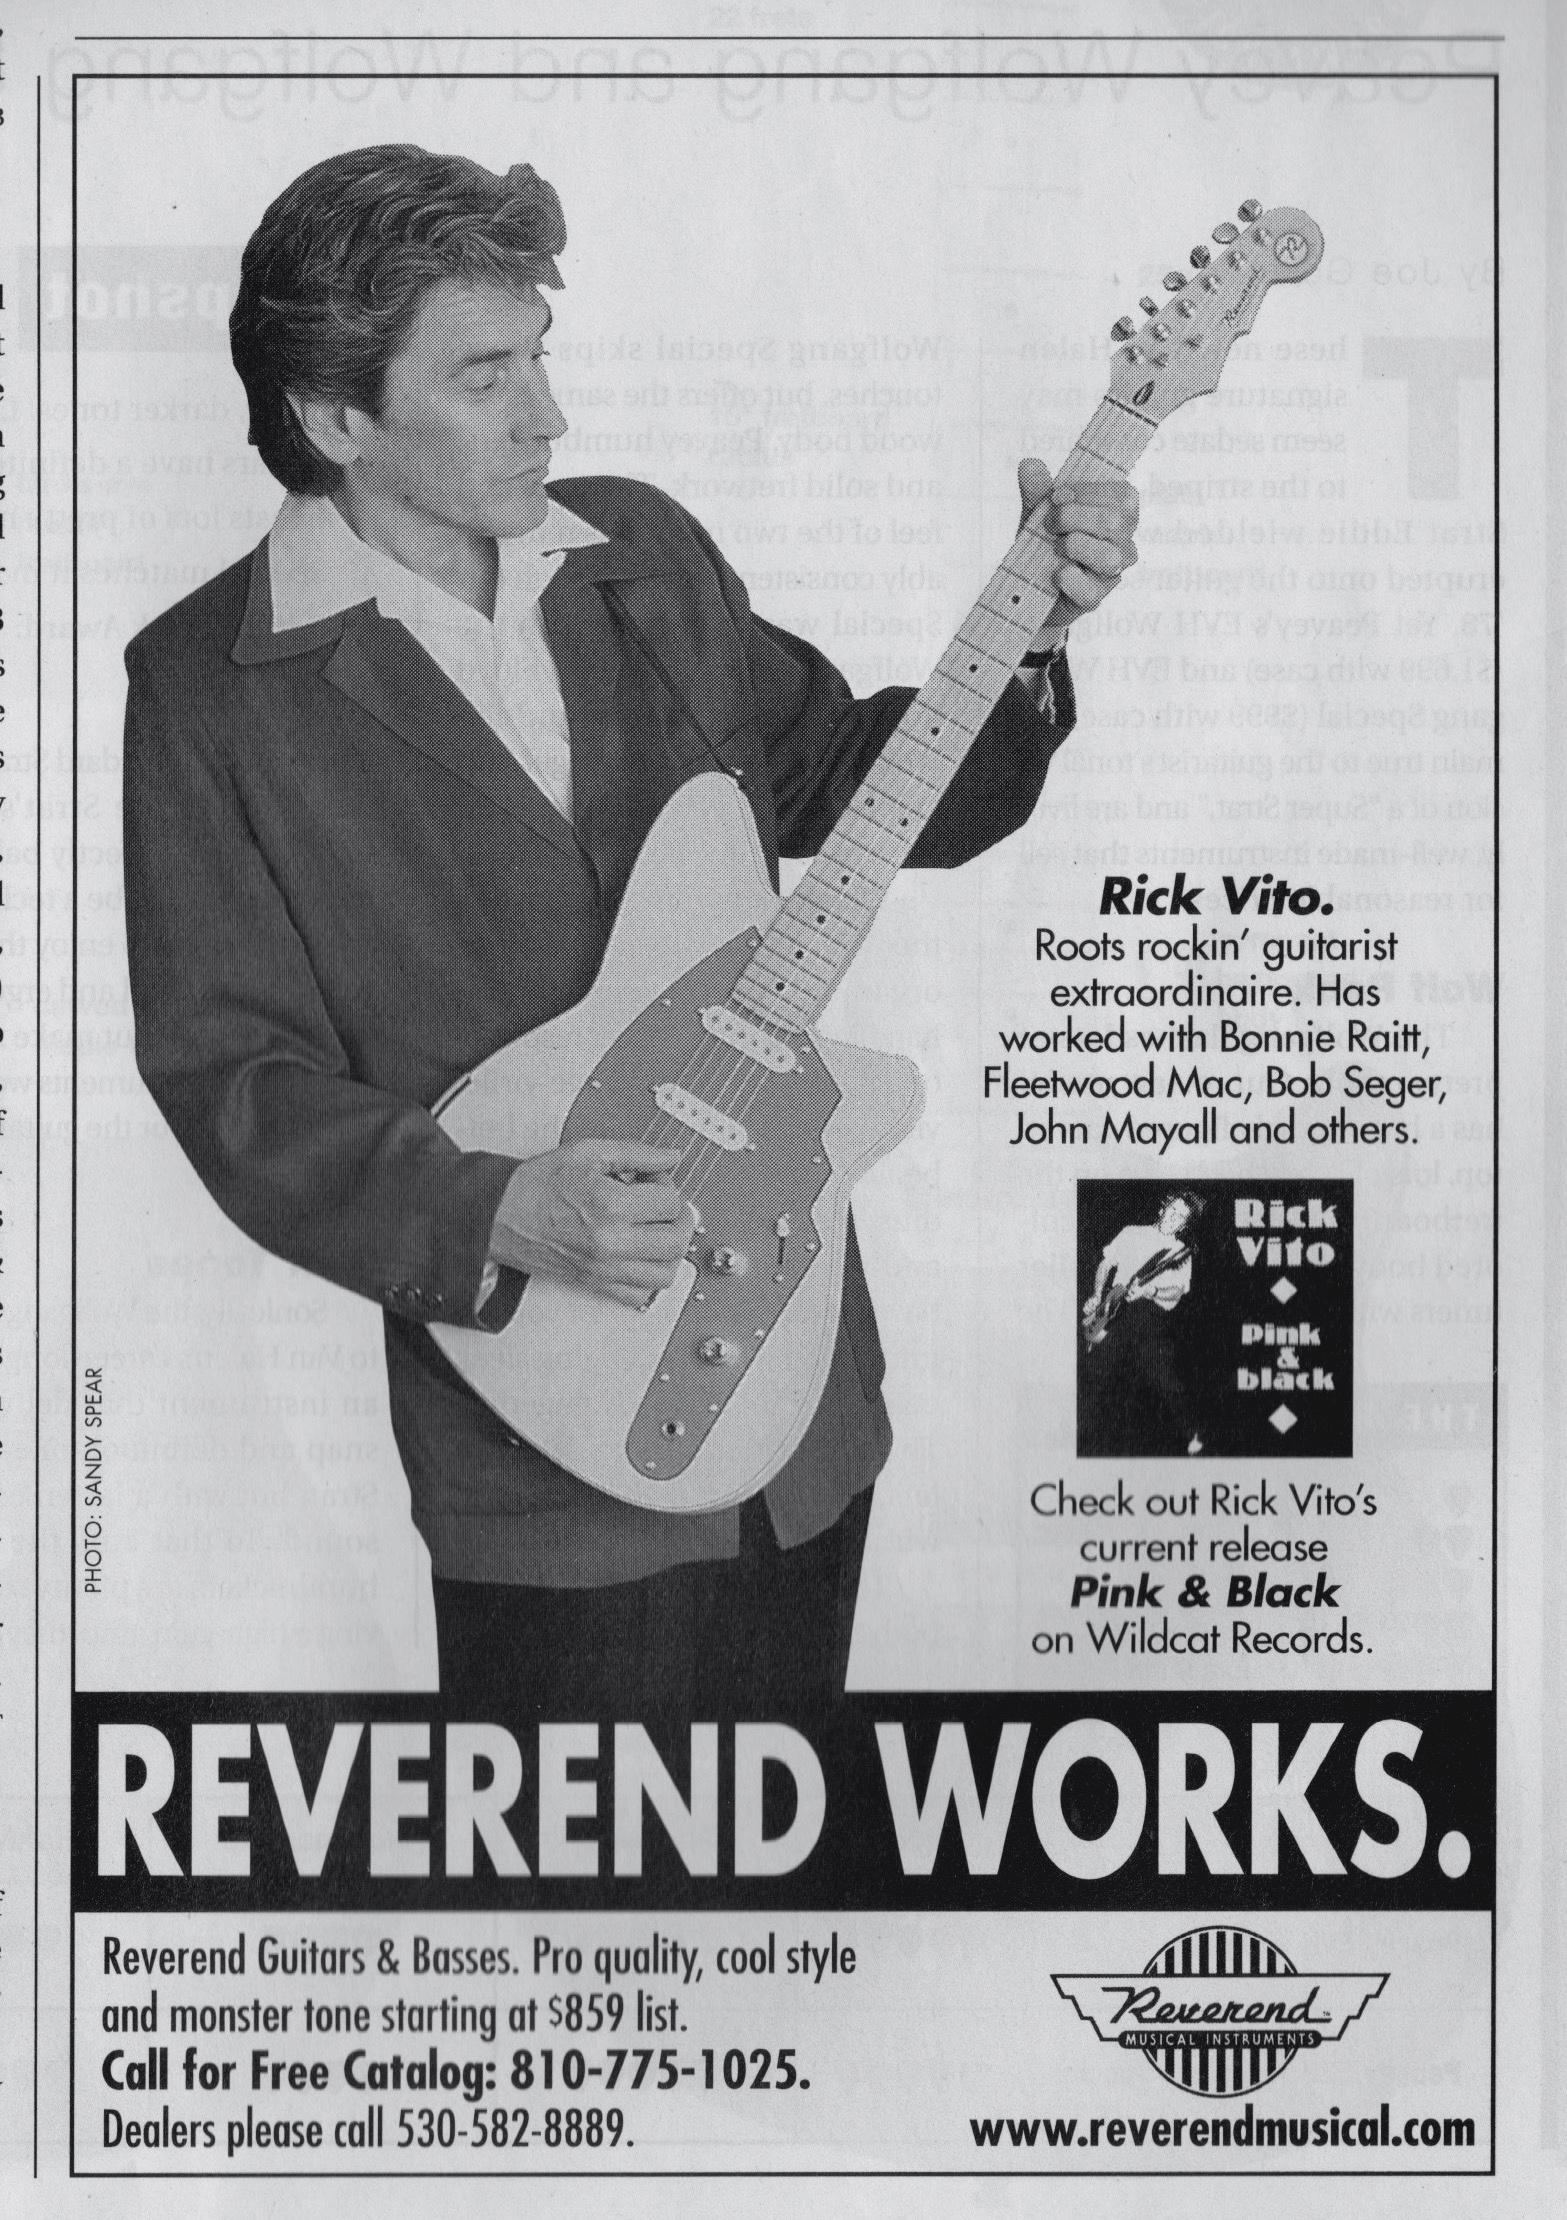 Rick Vito ad, 1999.